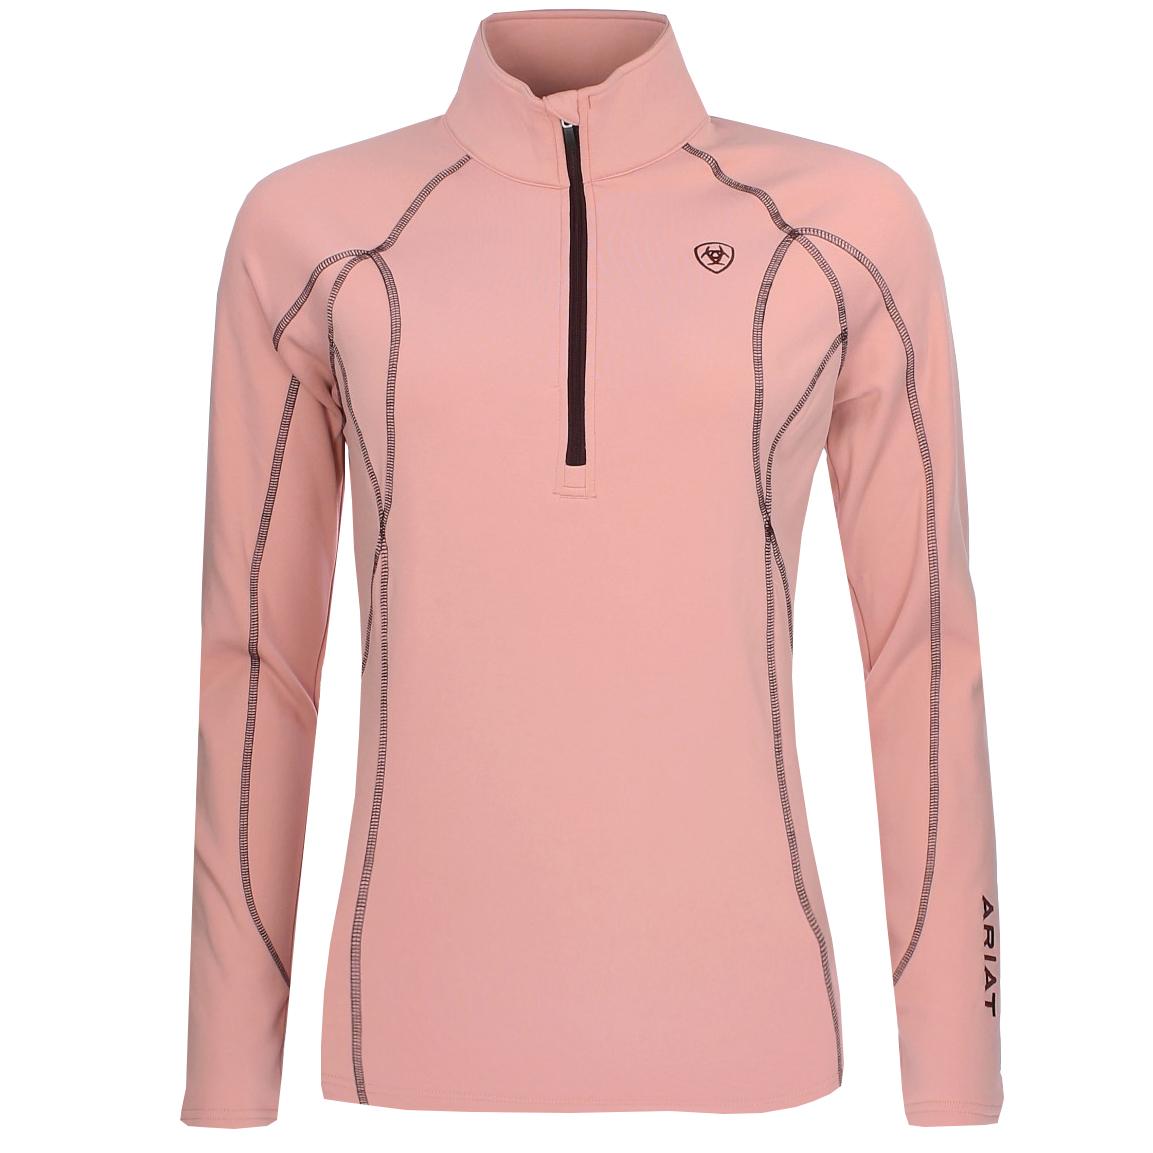 Ariat Conquest nj20 techshirt roze maat:s